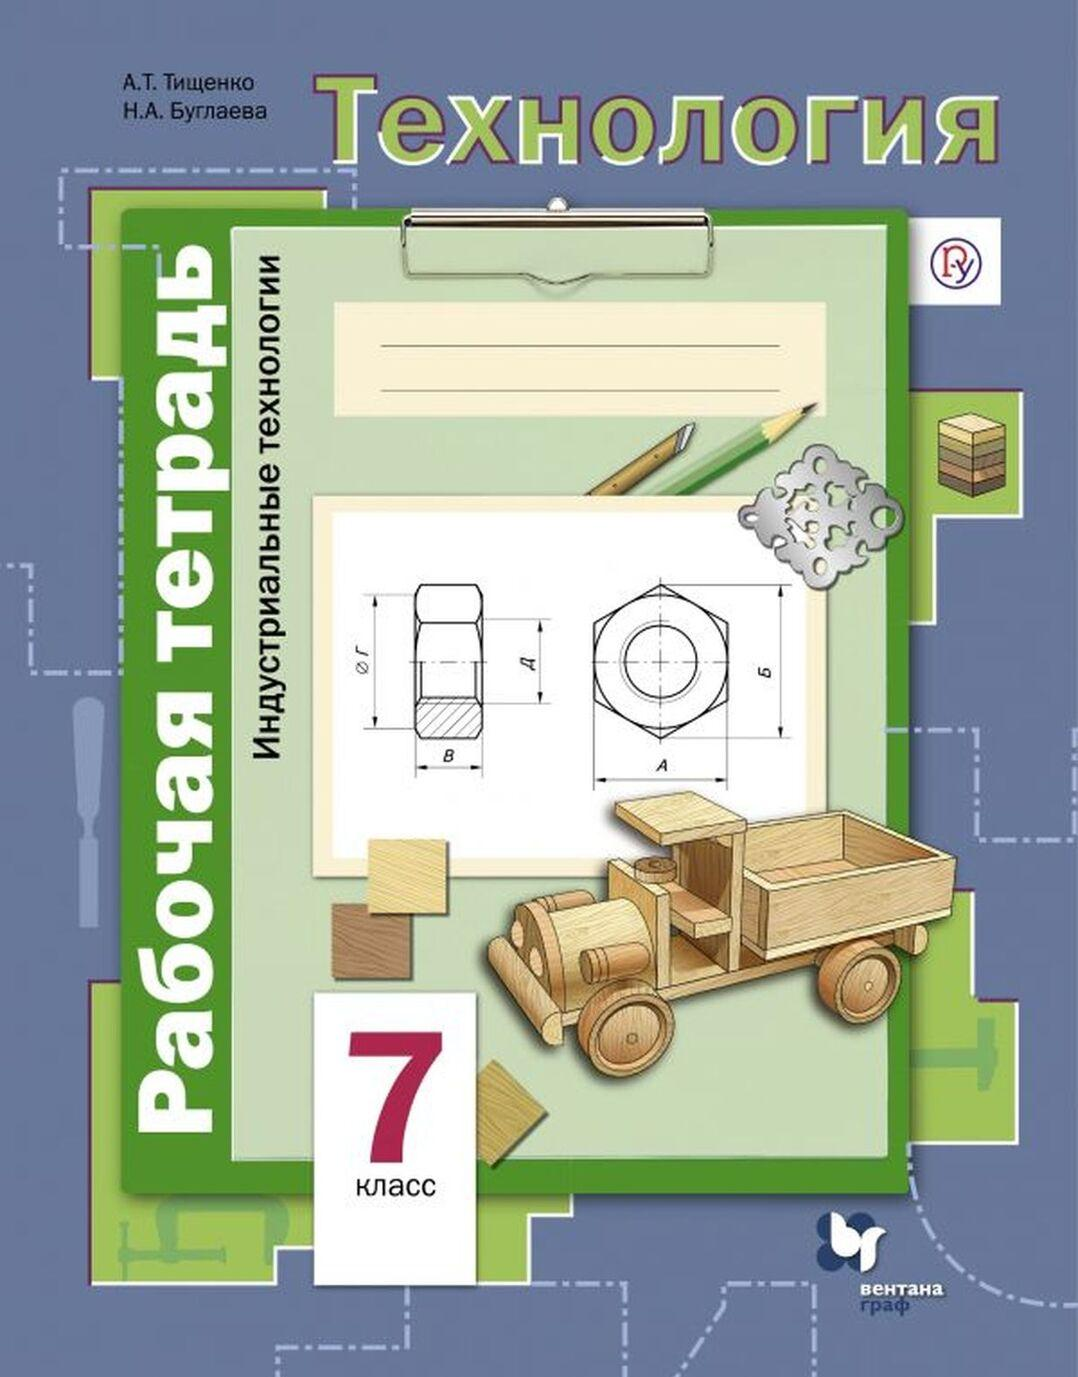 Tekhnologija. Industrialnye tekhnologii. 7klass. Rabochaja tetrad | Tischenko Aleksej Timofeevich, Buglaeva Nina Alekseevna